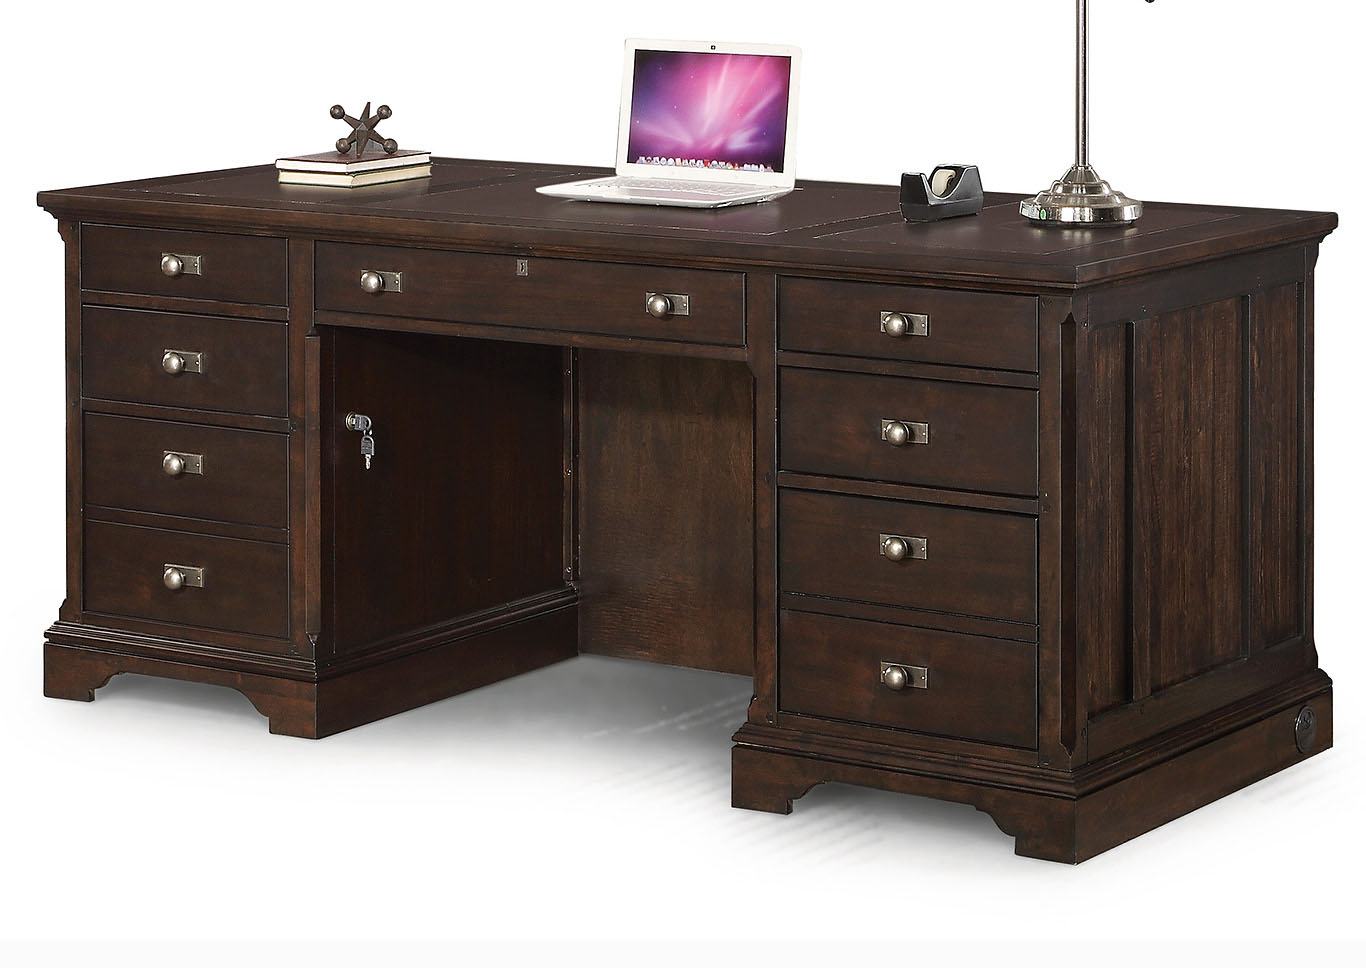 Walnut Creek Executive Desk,Flexsteel